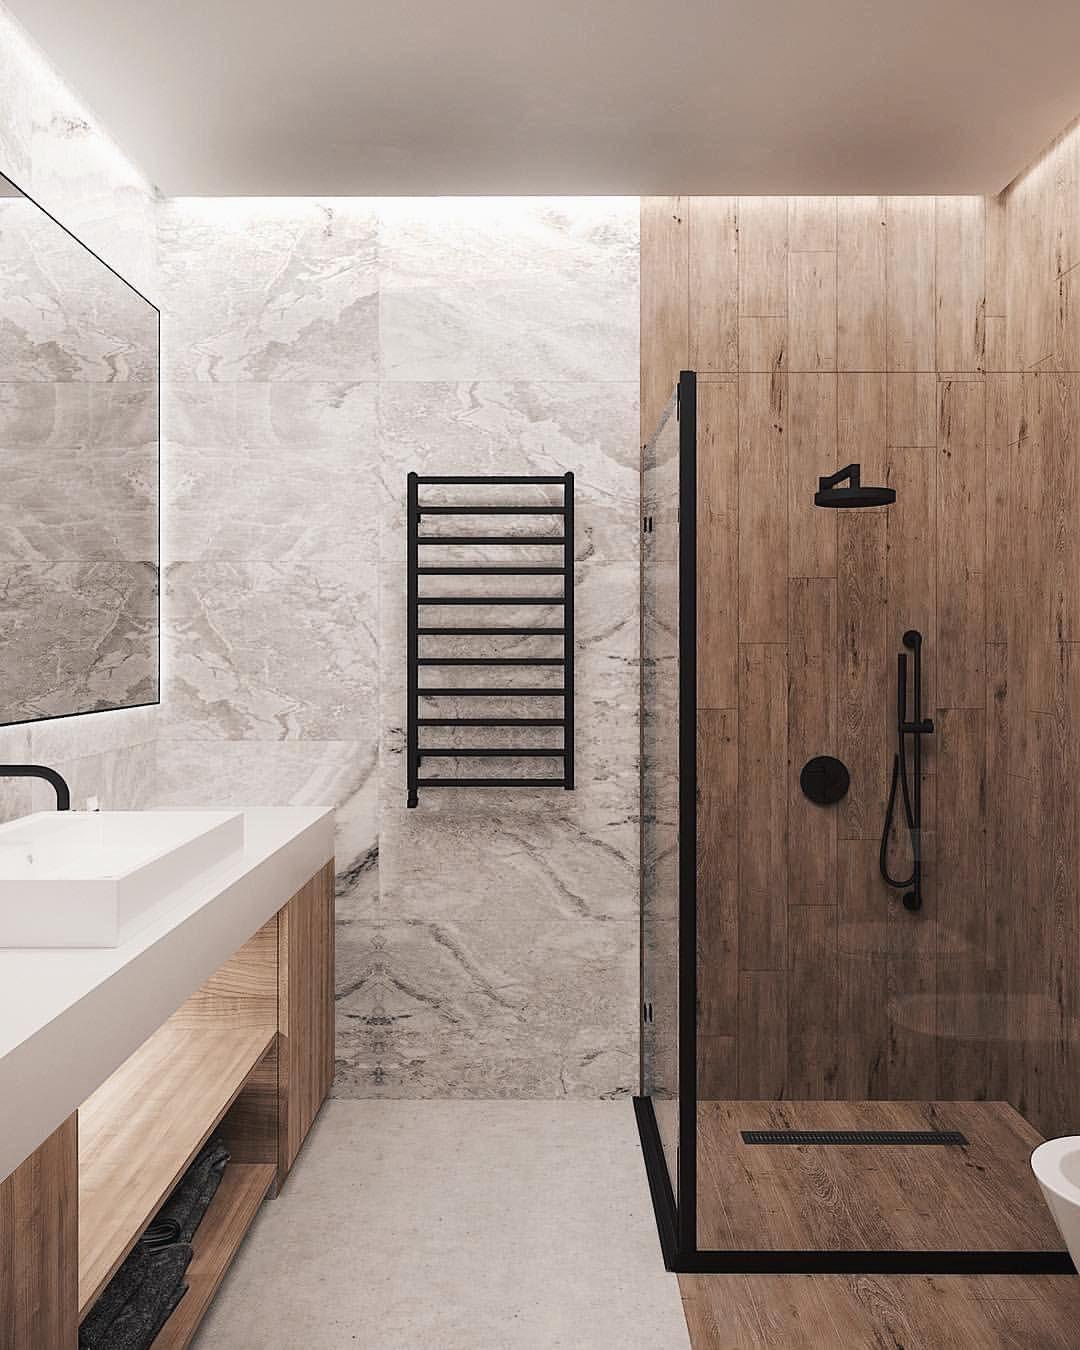 LOFT INTERIOR DESIGN IDEAS (loft_interior) • Instagram ...